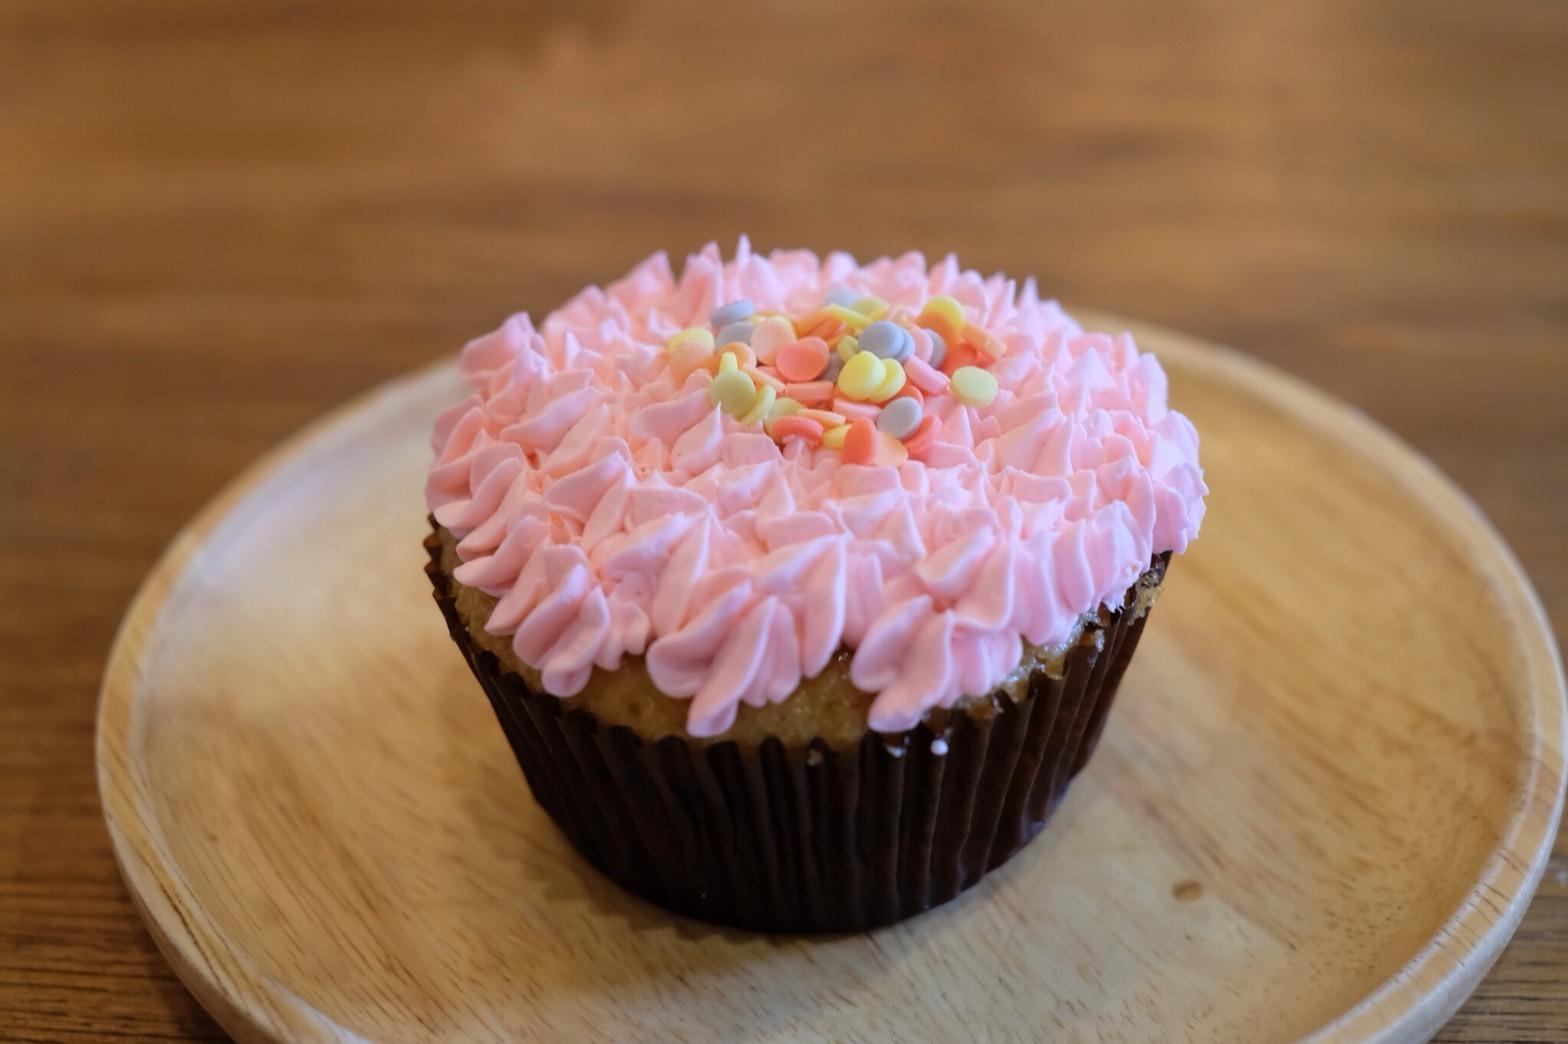 Kids Cupcakes (24 pieces)